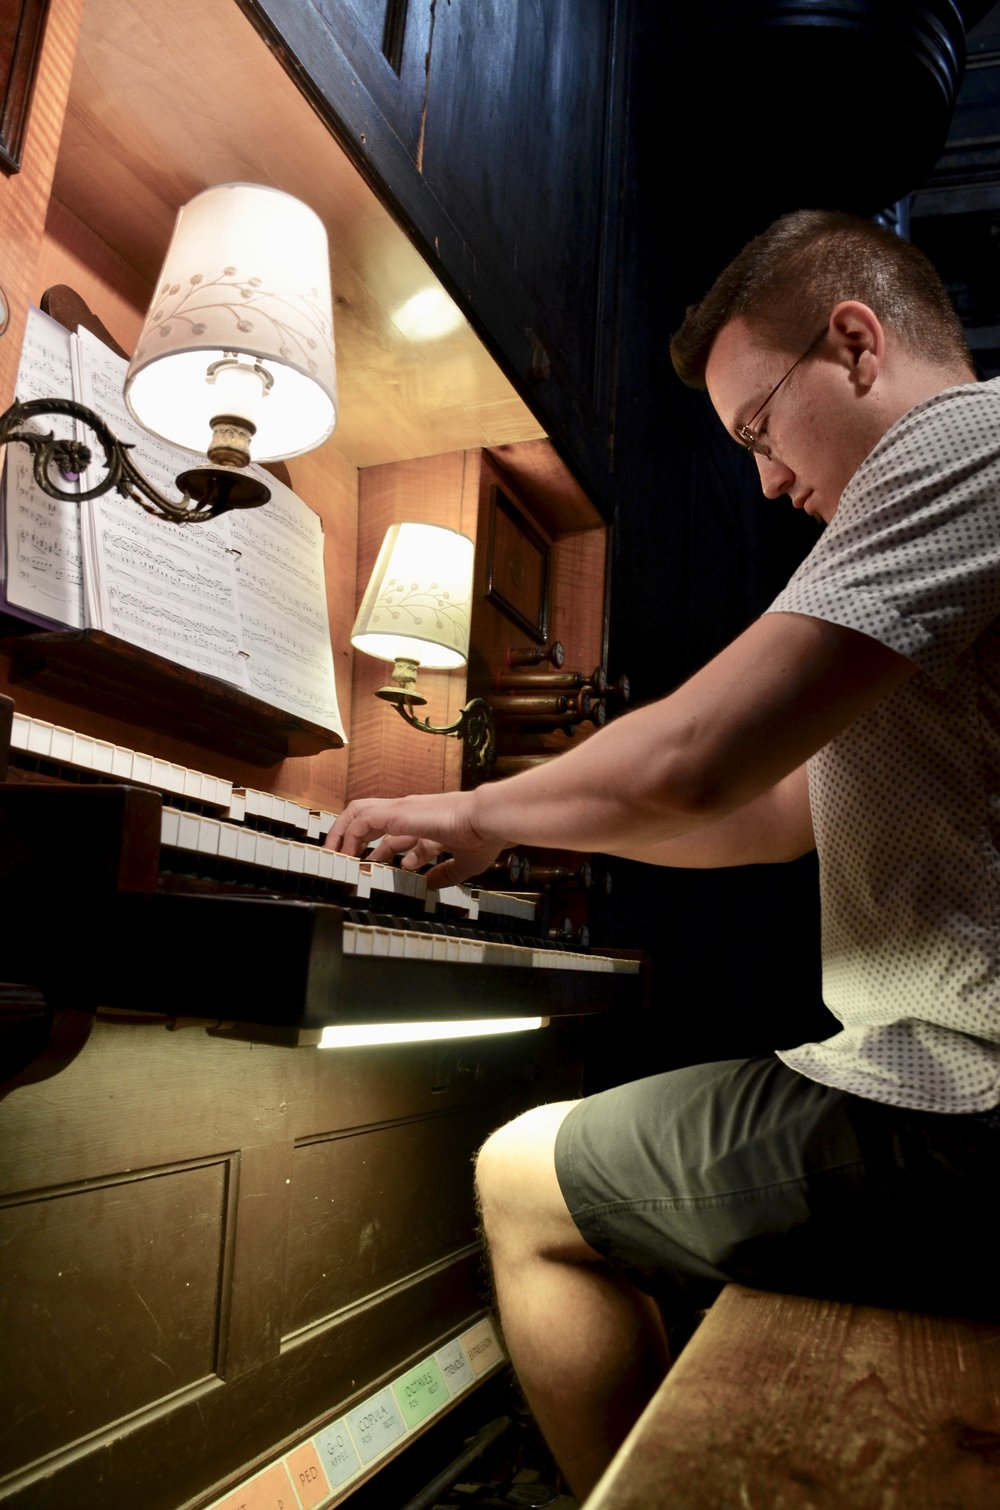 Corey De Tar plays the organ in Notre Dame la Daurade, Toulouse